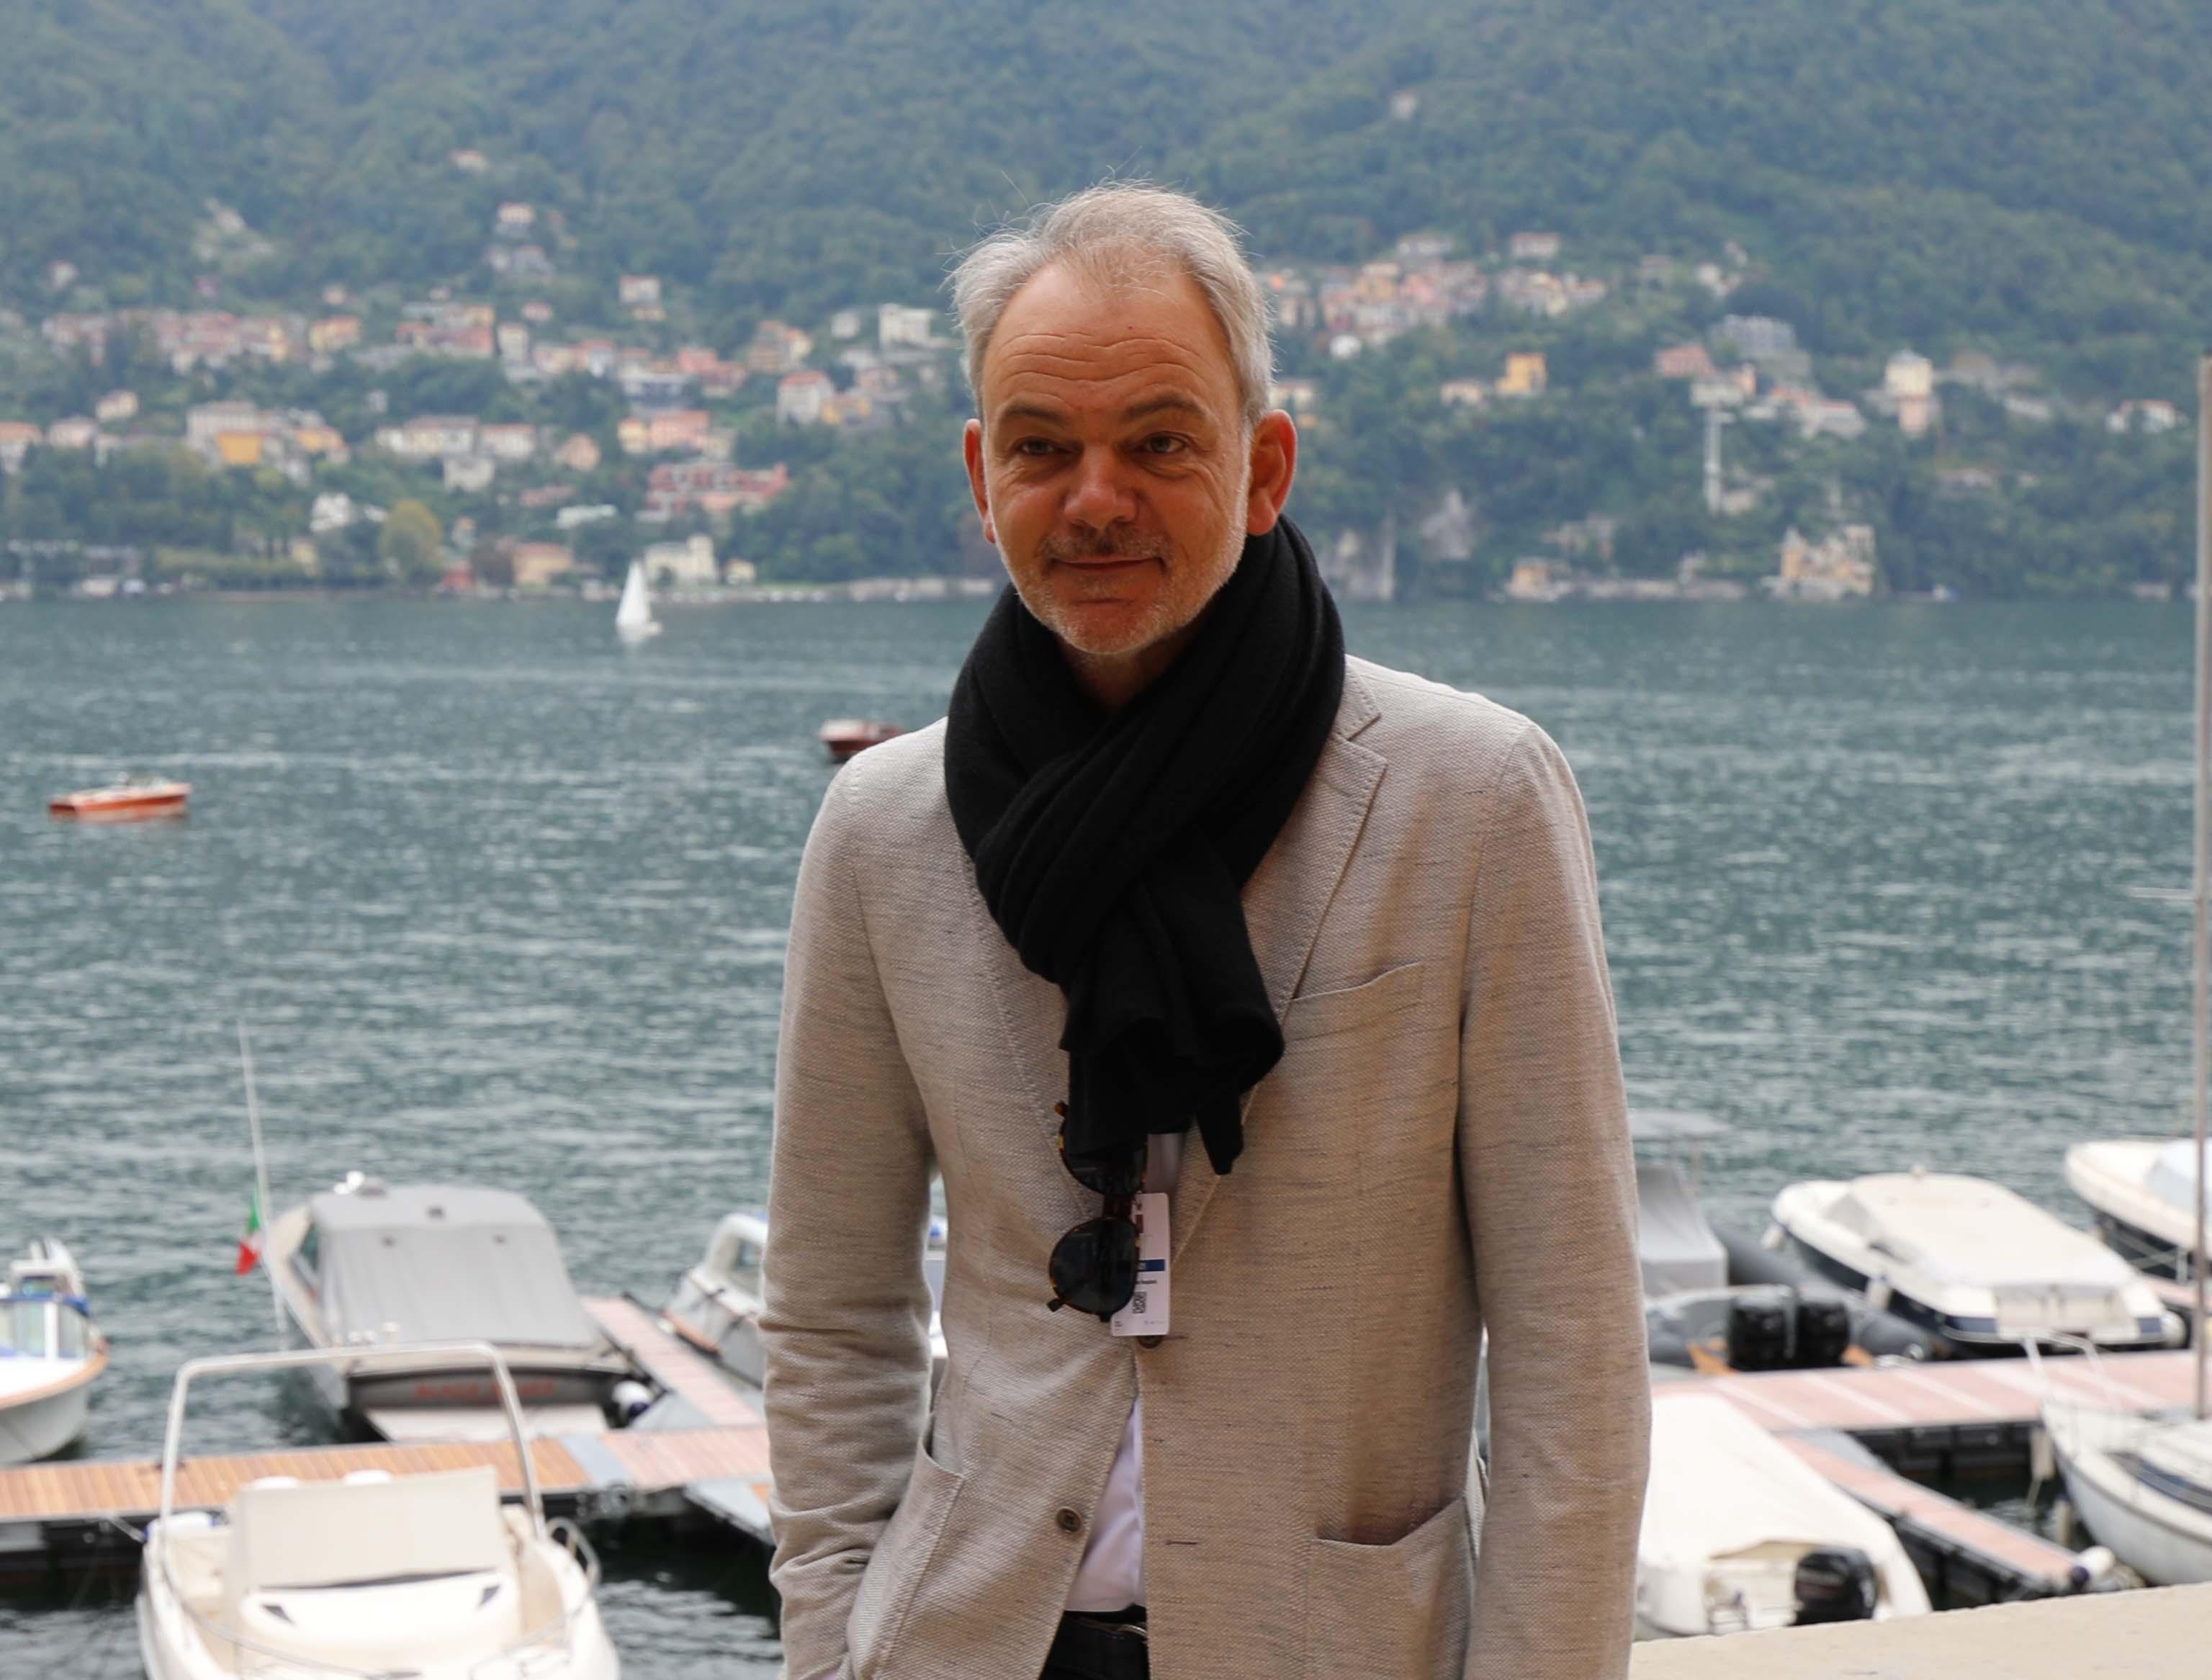 BMWs designsjef i avslappet positur